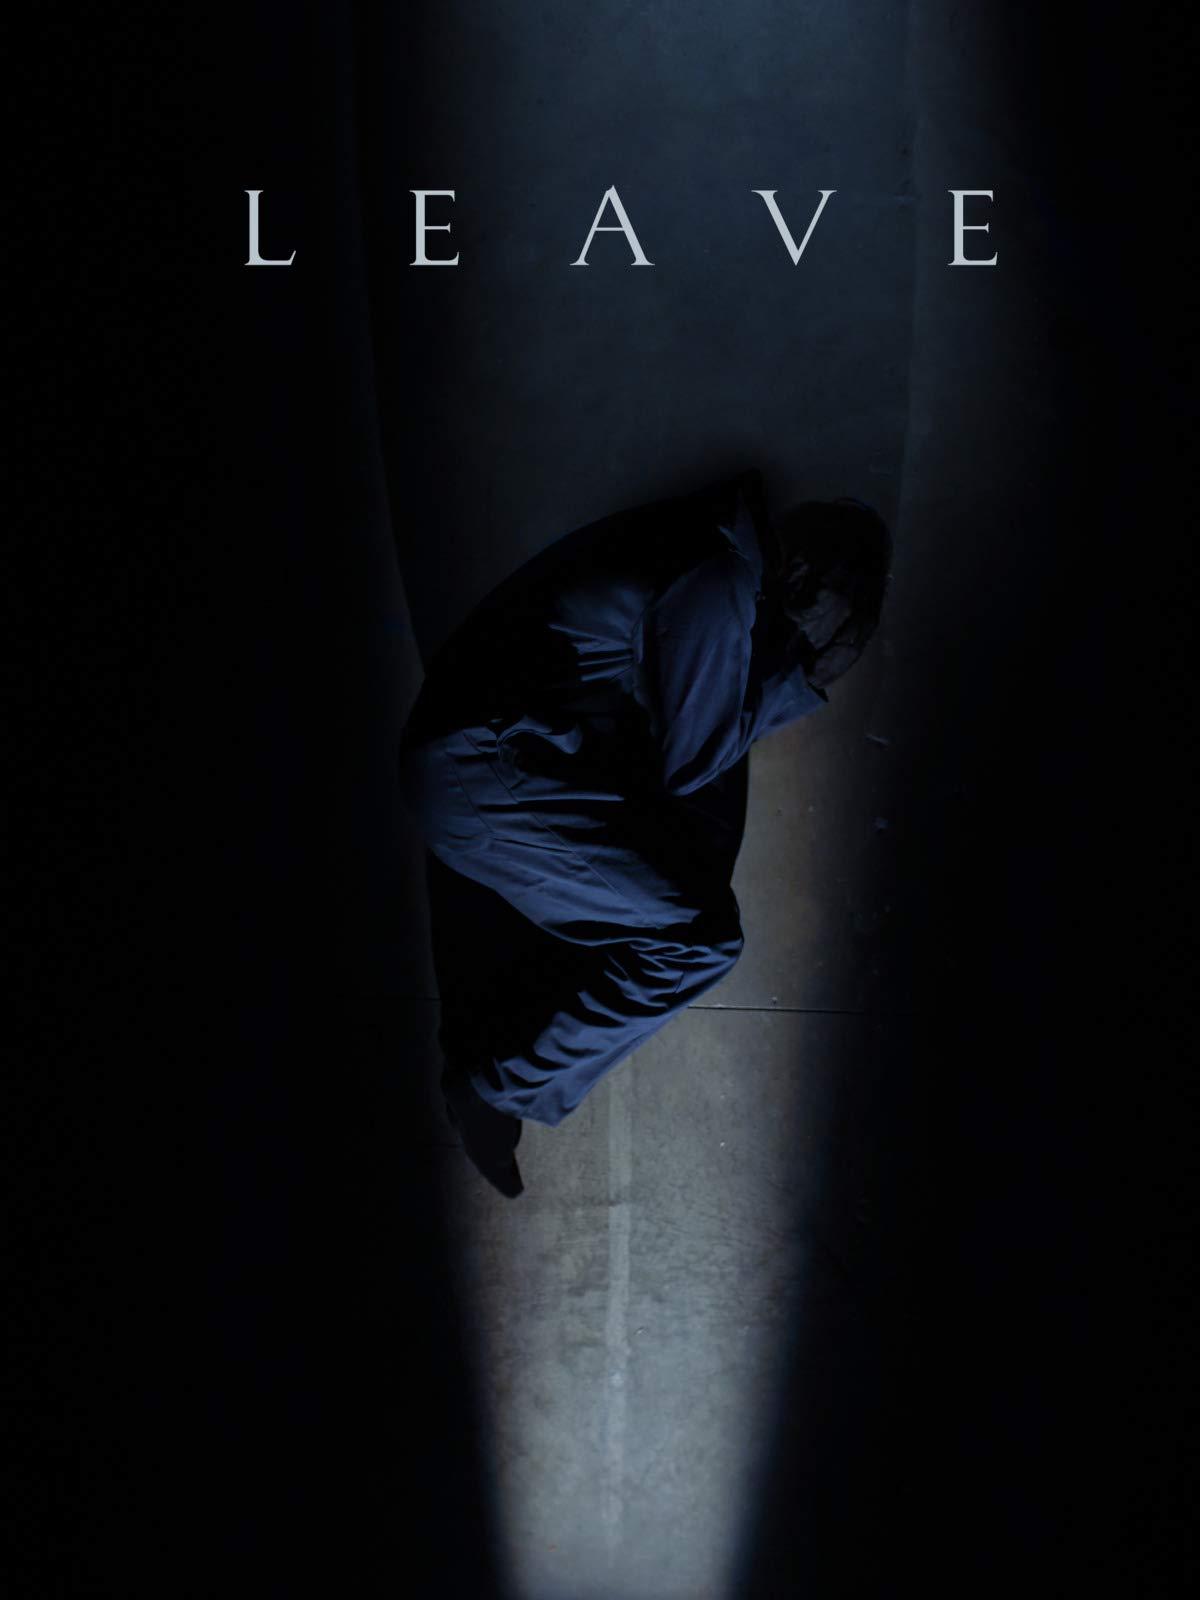 Leave on Amazon Prime Video UK